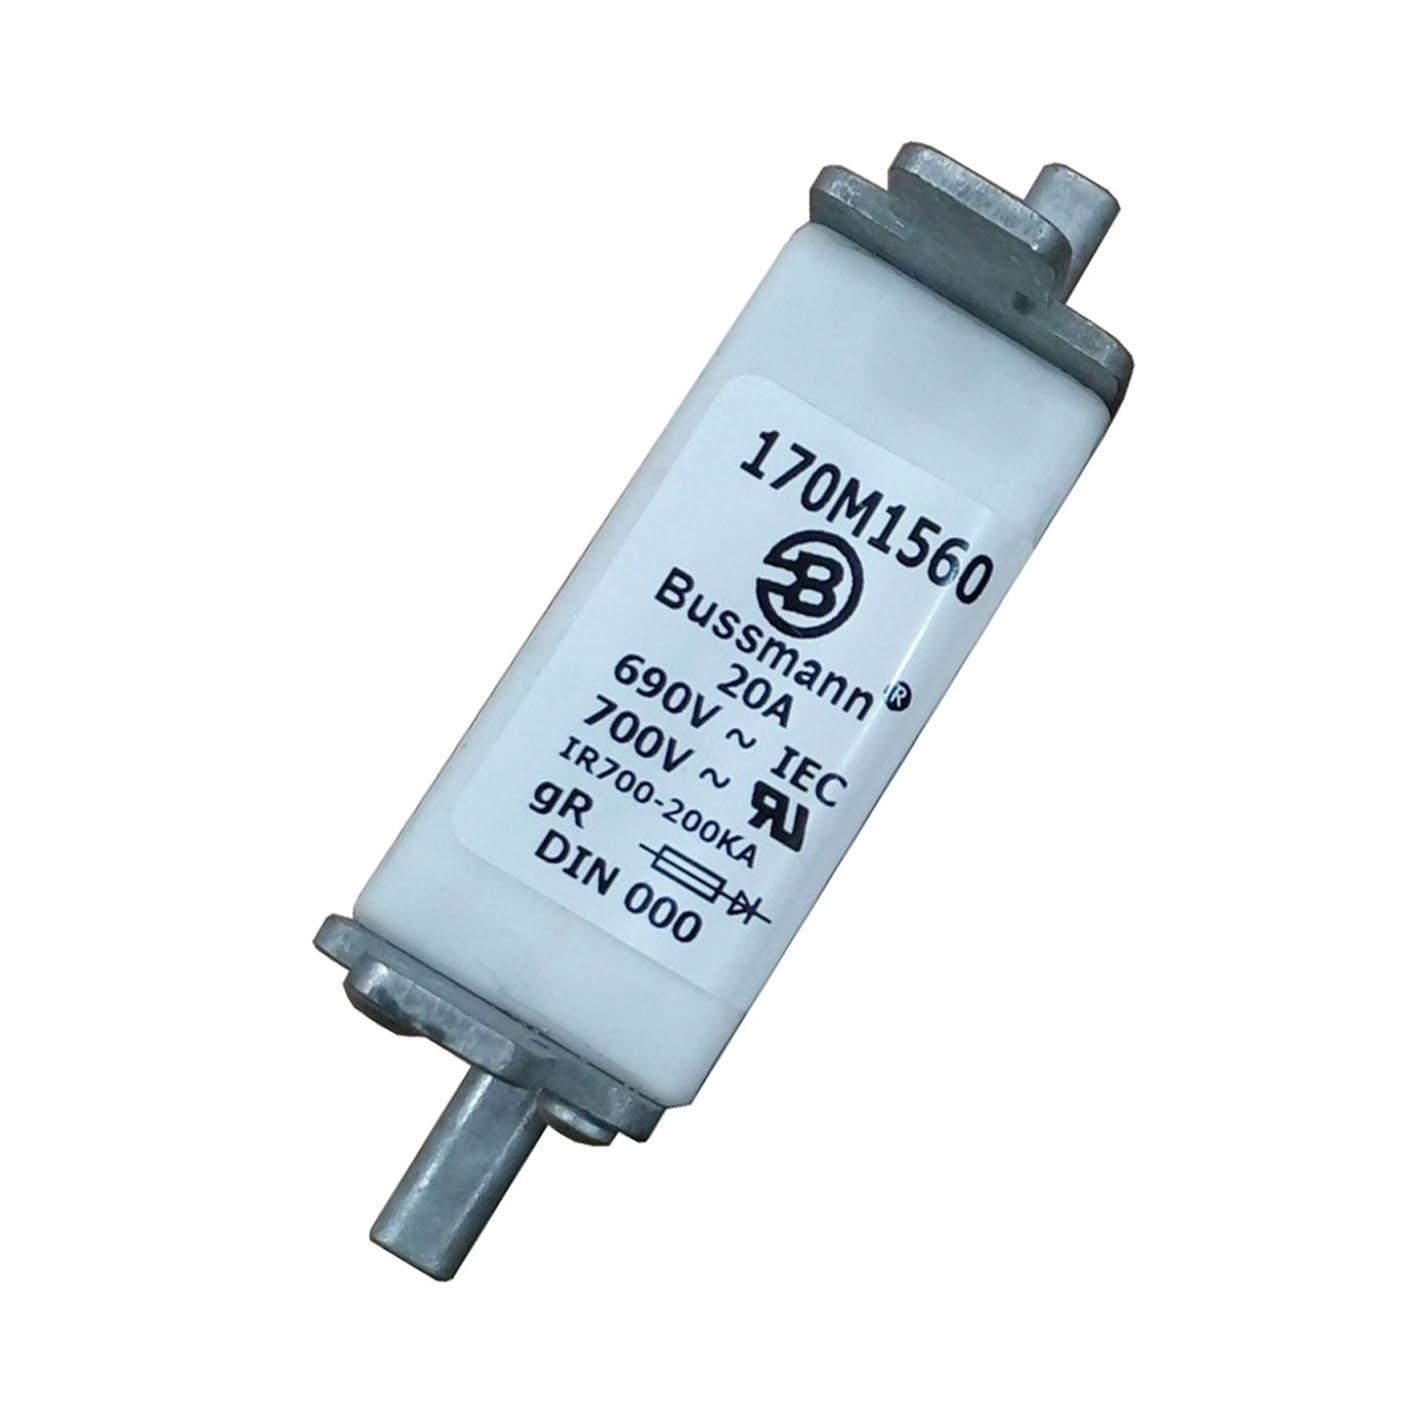 Bussmann 170M1560 high speed fuse|ABPower